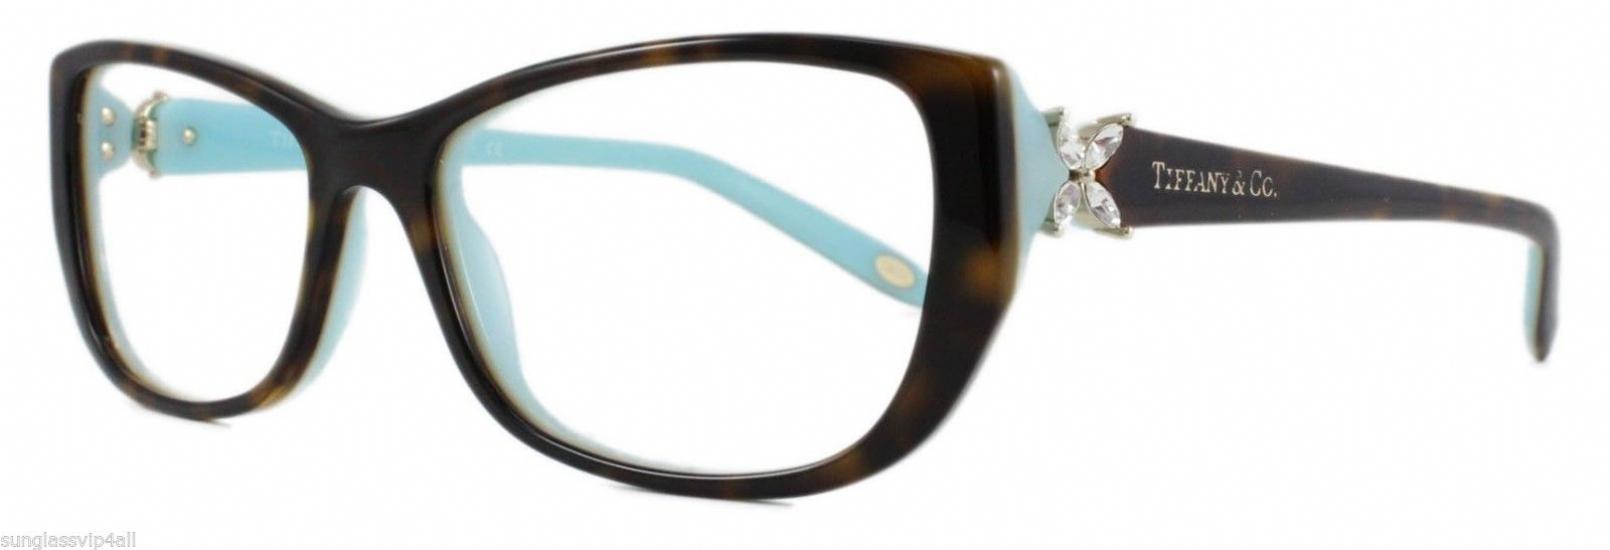 Tiffany 2044b Eyeglasses